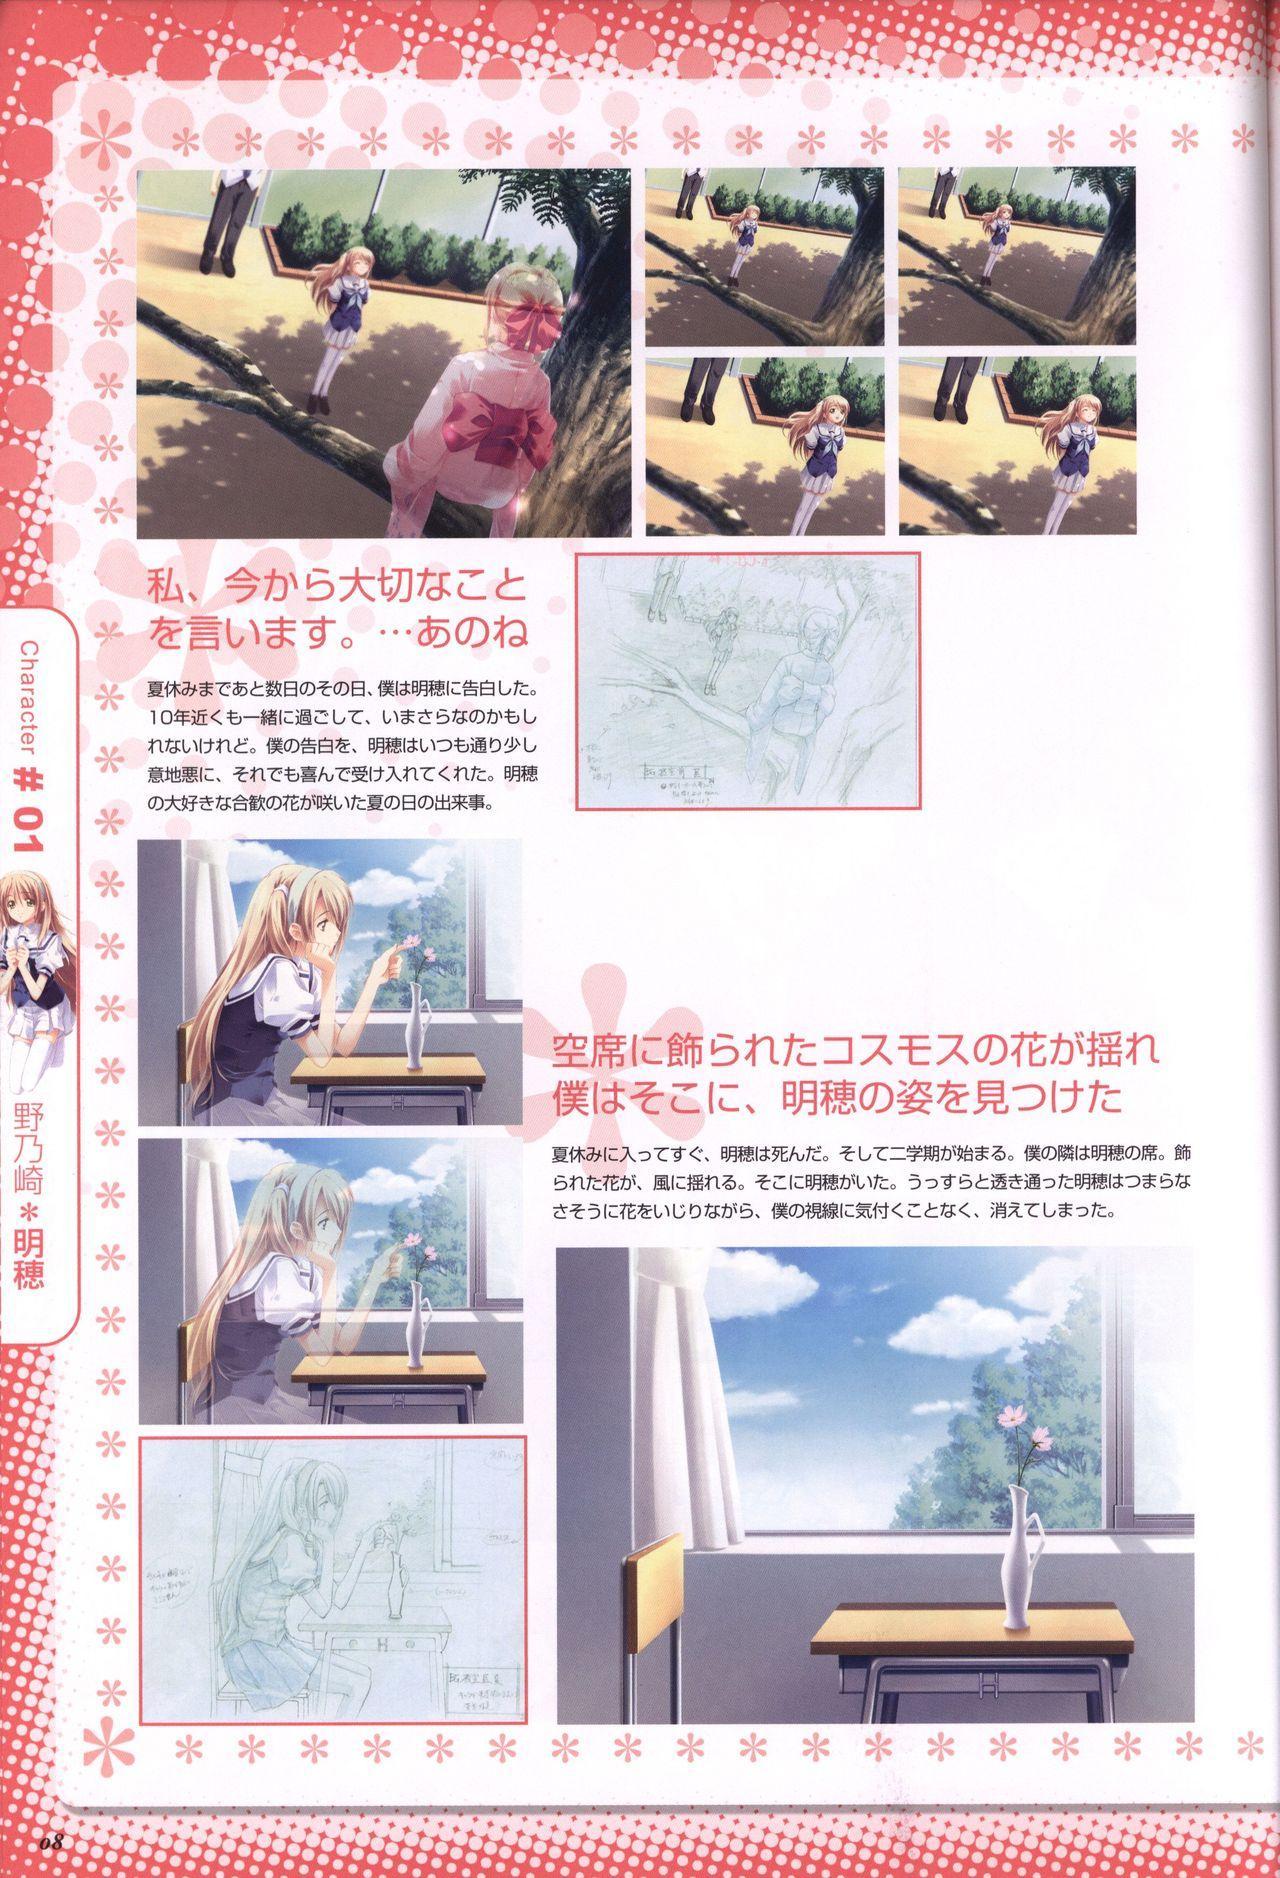 Moshimo Ashita ga Harenaraba official fanbook 8